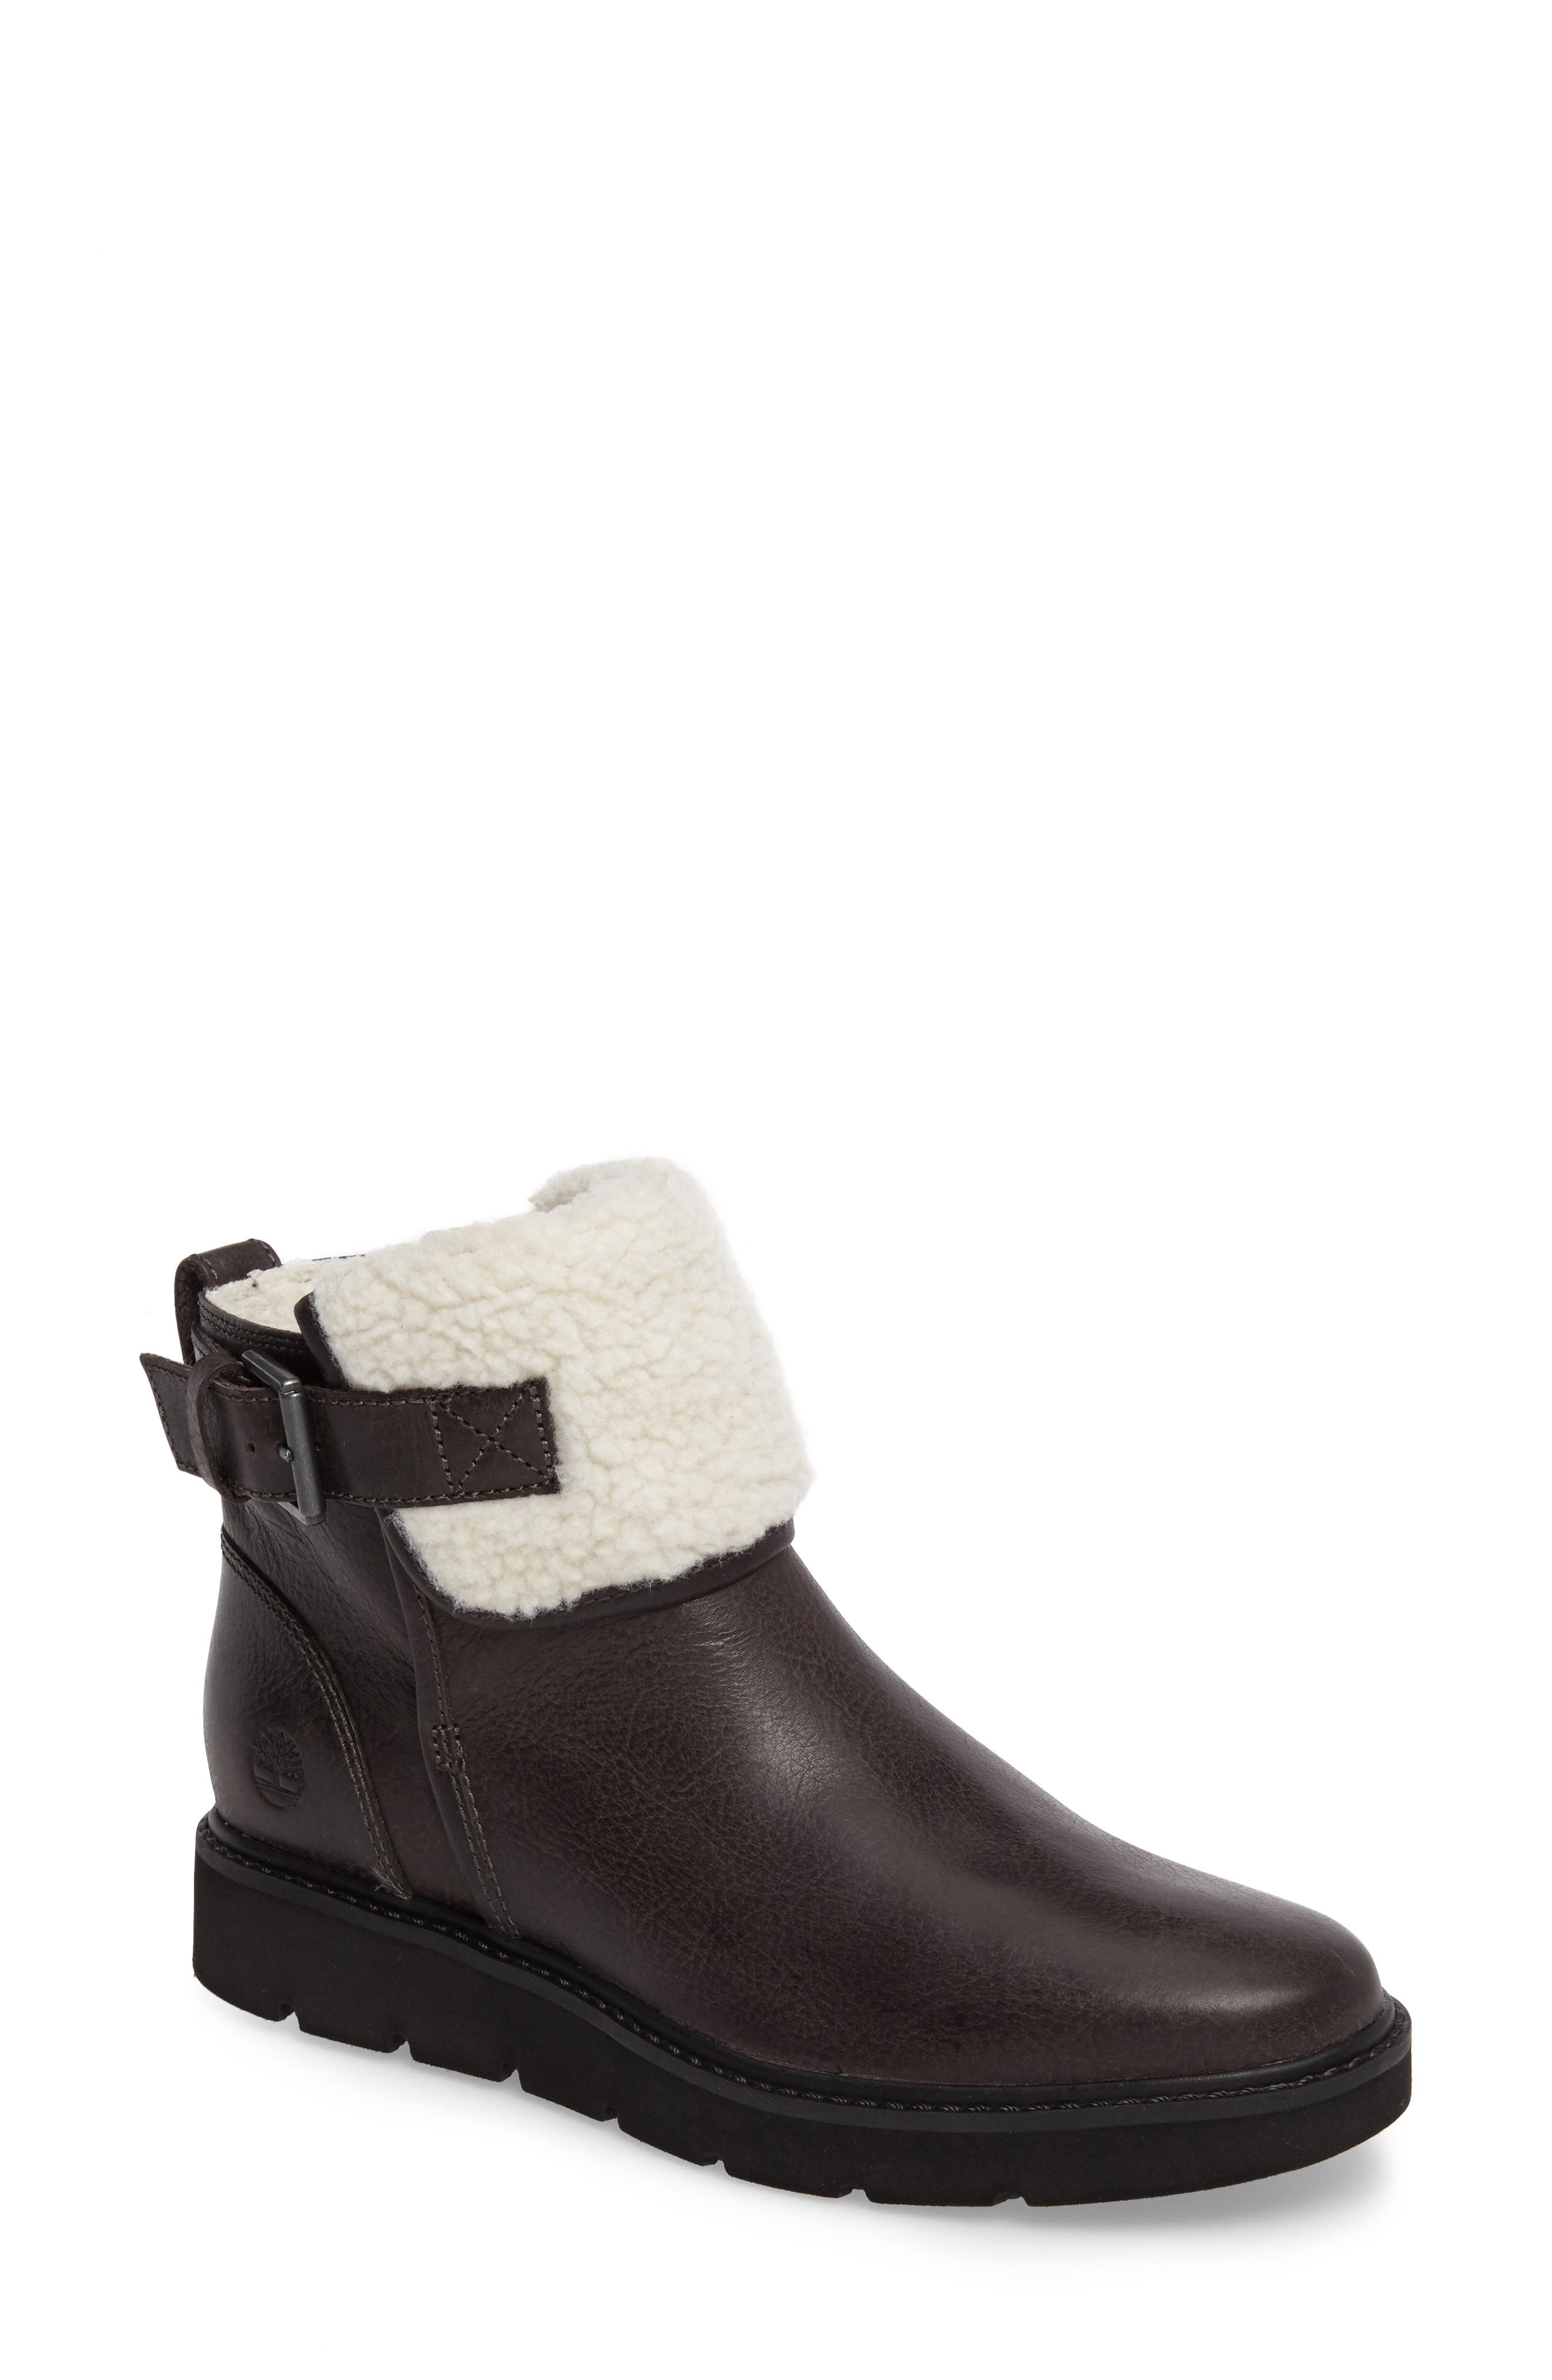 Kenniston Fleece Lined Boot,                             Main thumbnail 1, color,                             021